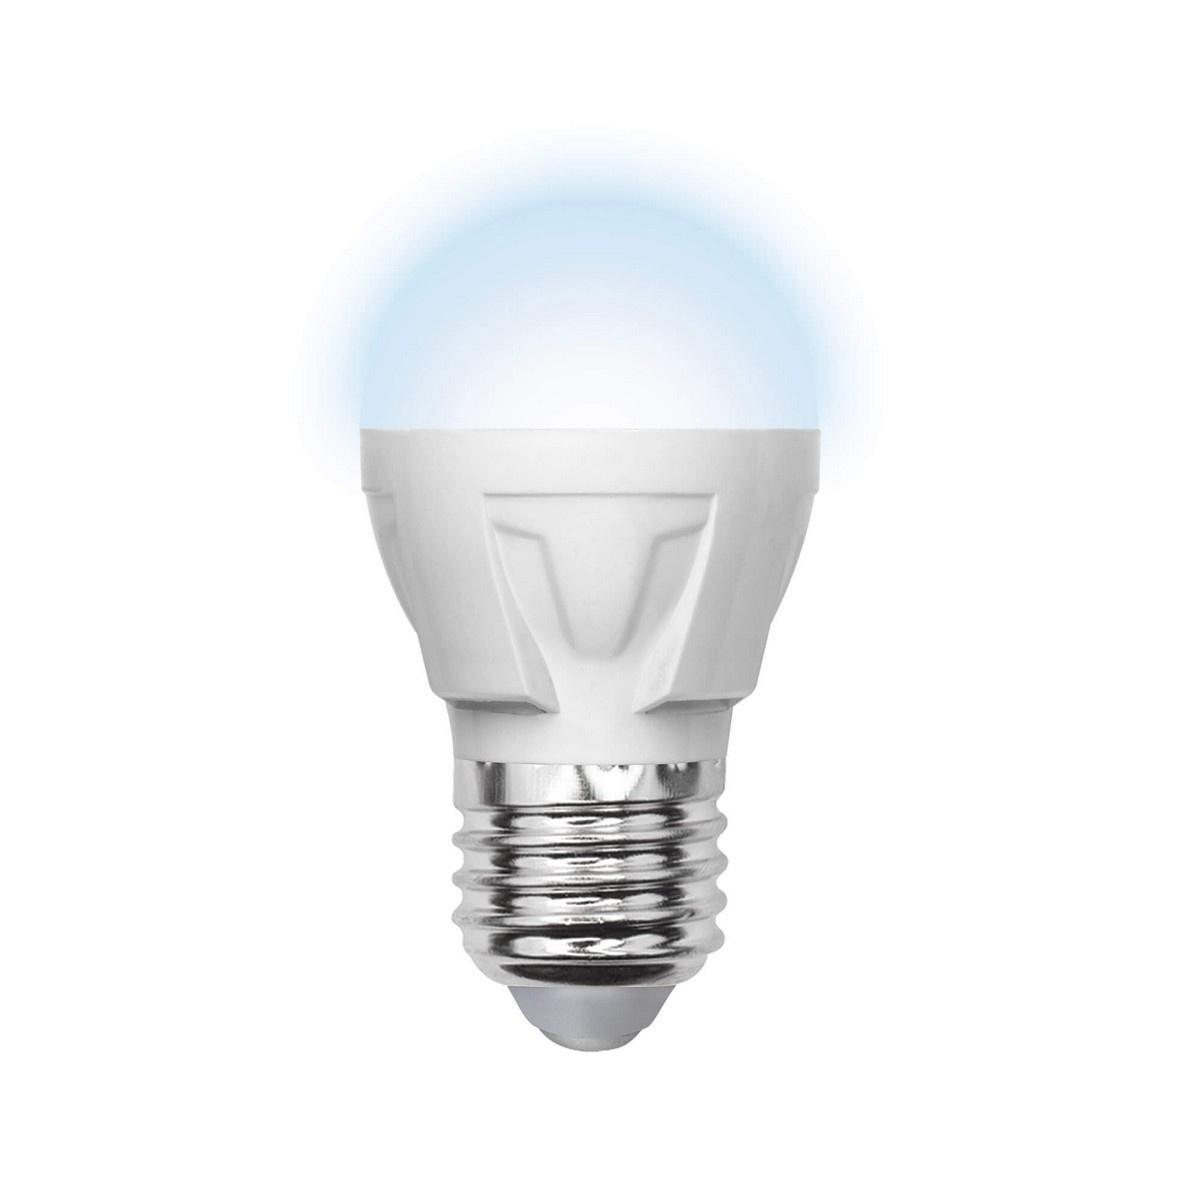 цена на Лампа светодиодная (09456) E27 6W 4500K матовая LED-G45-6W/NW/E27/FR/S